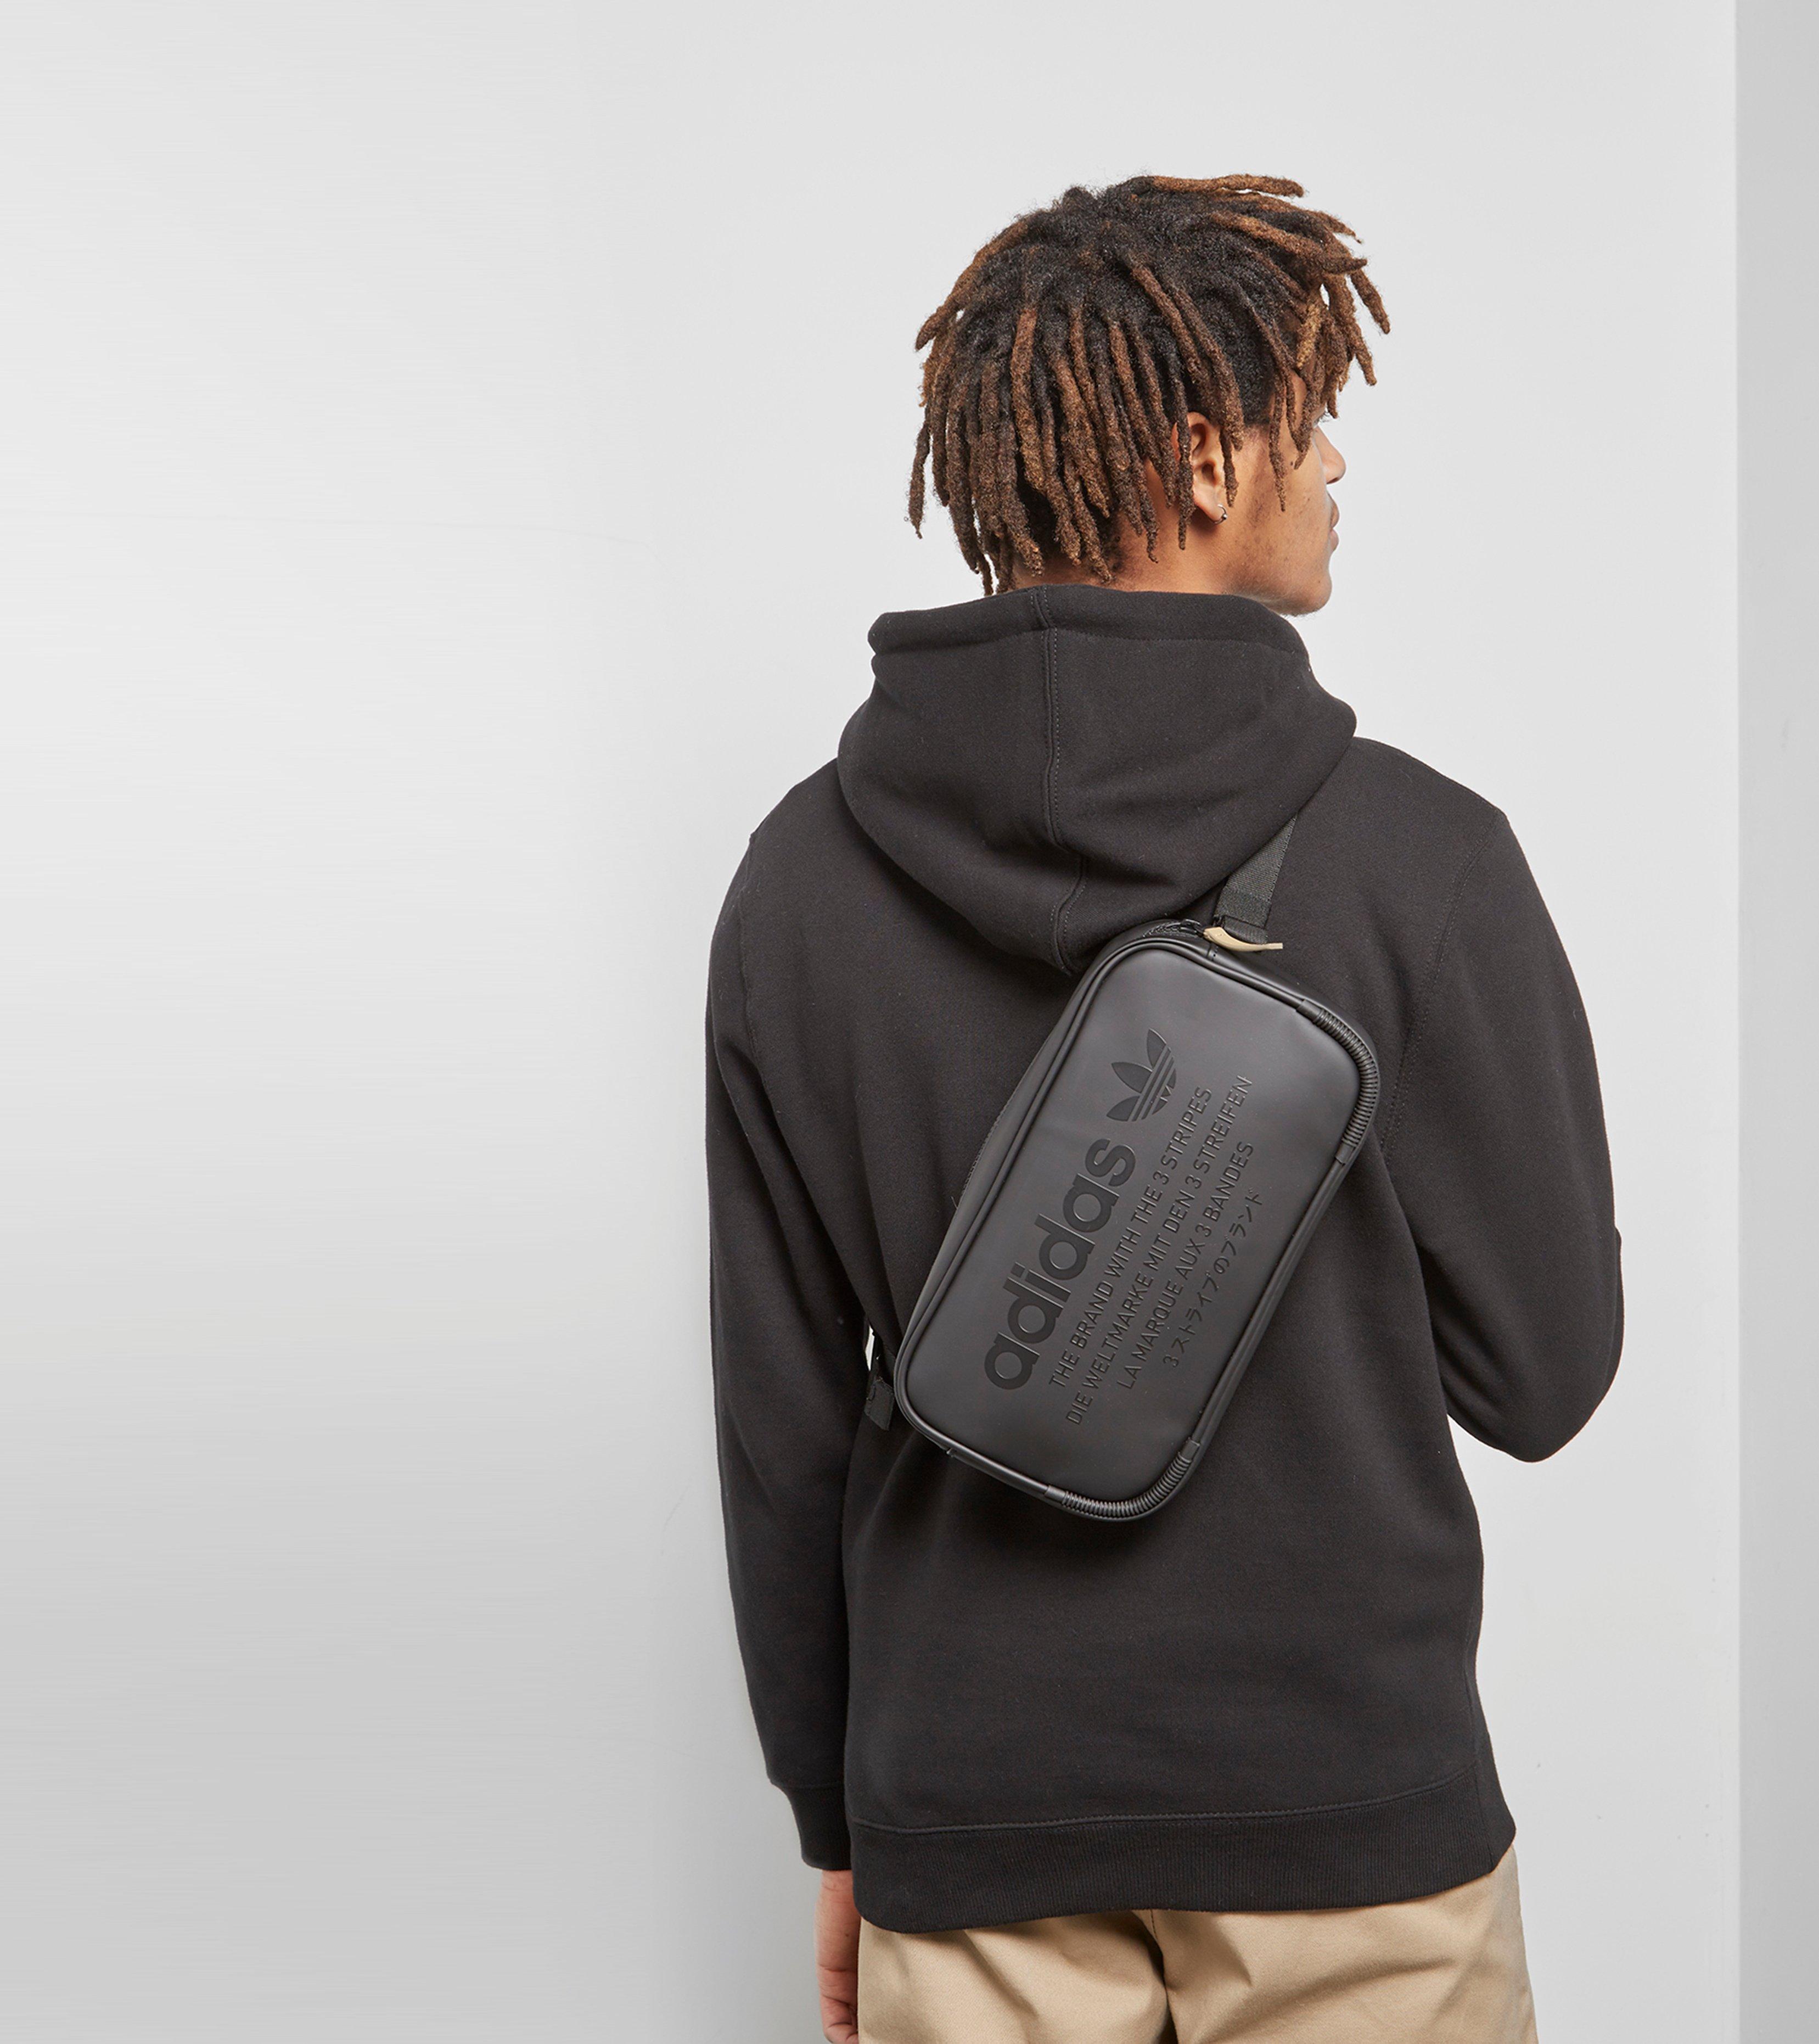 41022cc8a7 Lyst - adidas Originals Nmd Side Bag in Black for Men